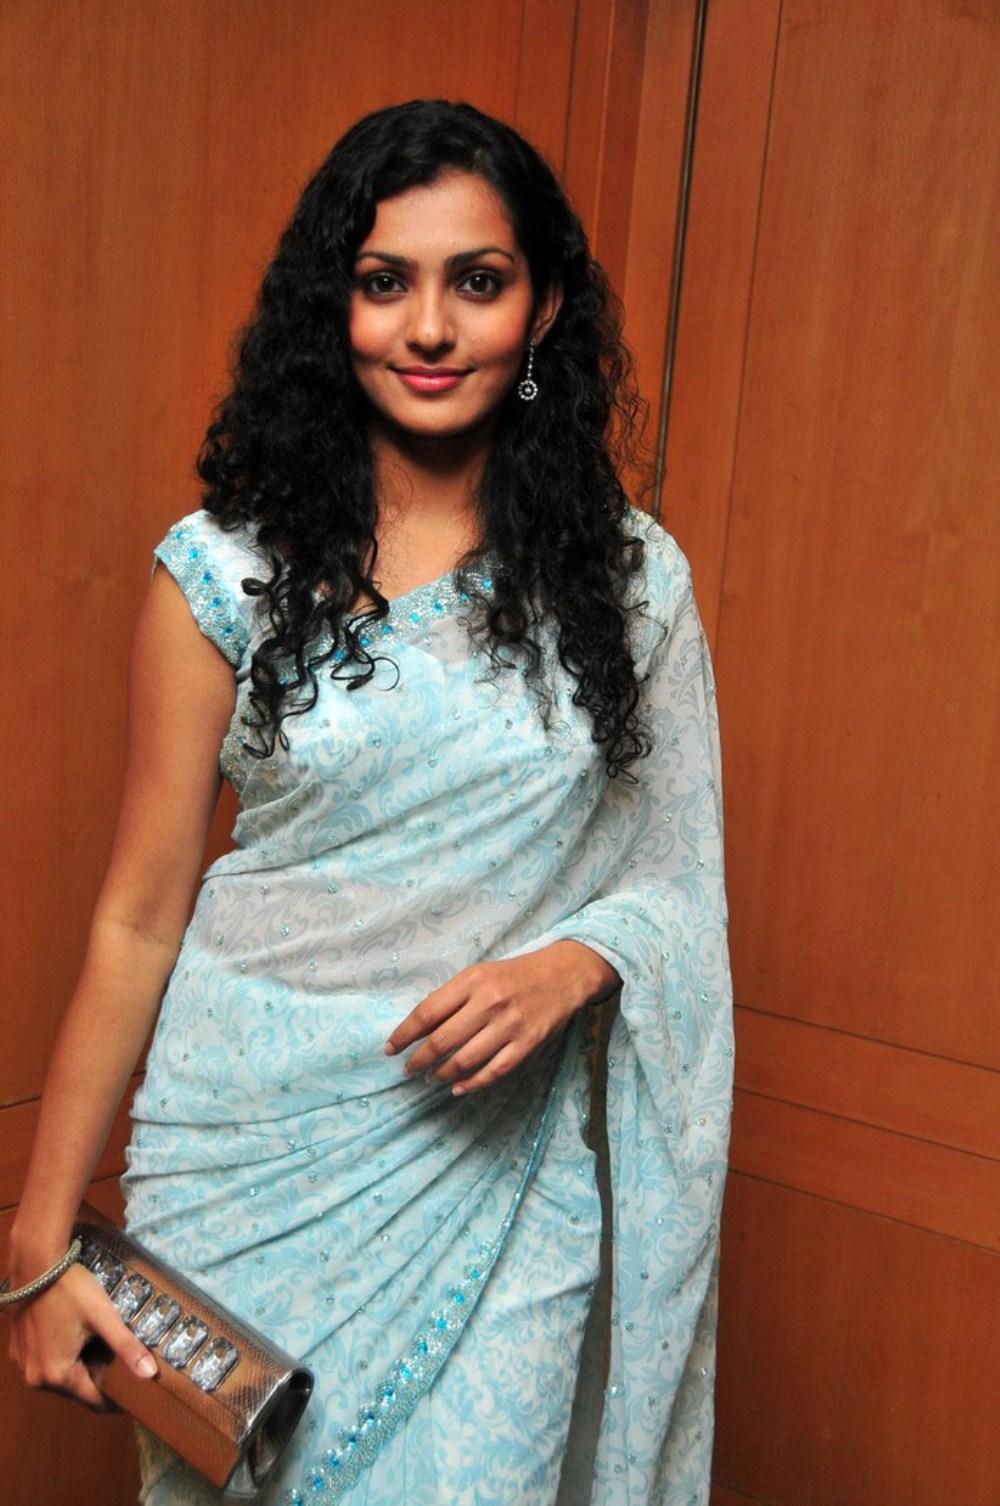 Actress-Parvathi-Menon-in-Saree-at-Prithvi-IAS-Music-Release-at-Parvathi-Menon-at-Film-Prithvi-I-wallpaper-wp4803904